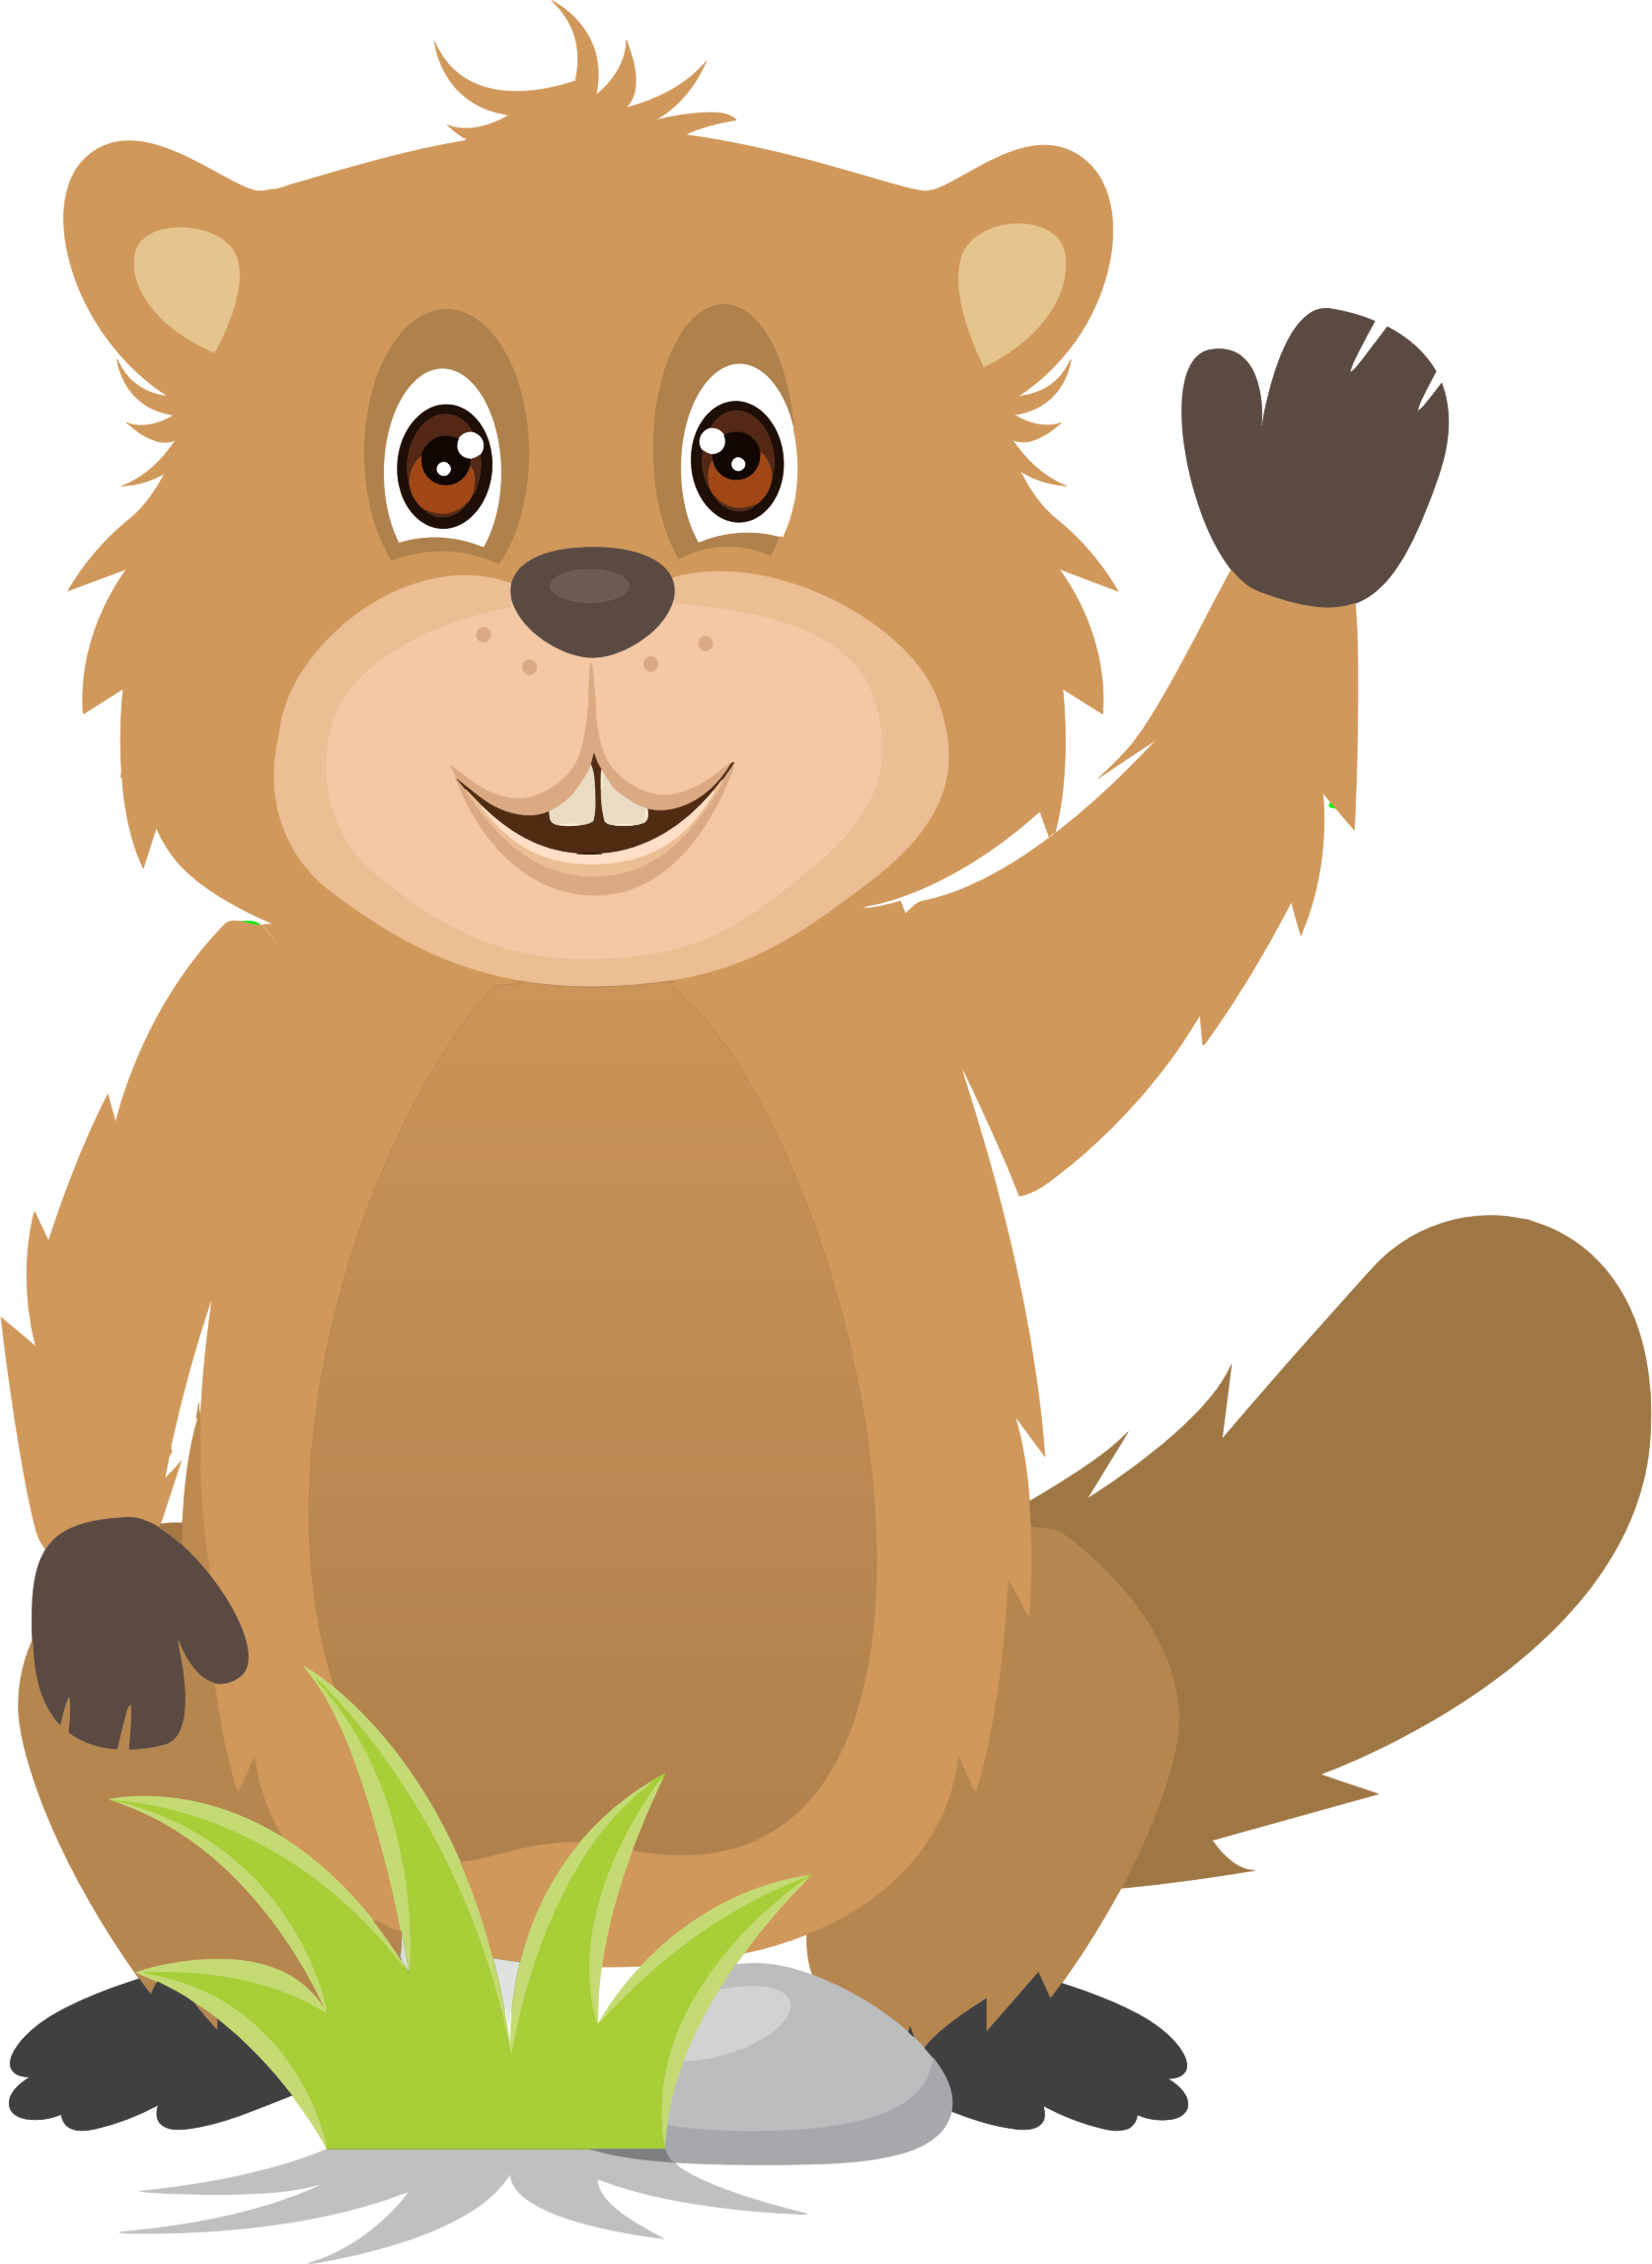 Free download clip art. Bear clipart friendly